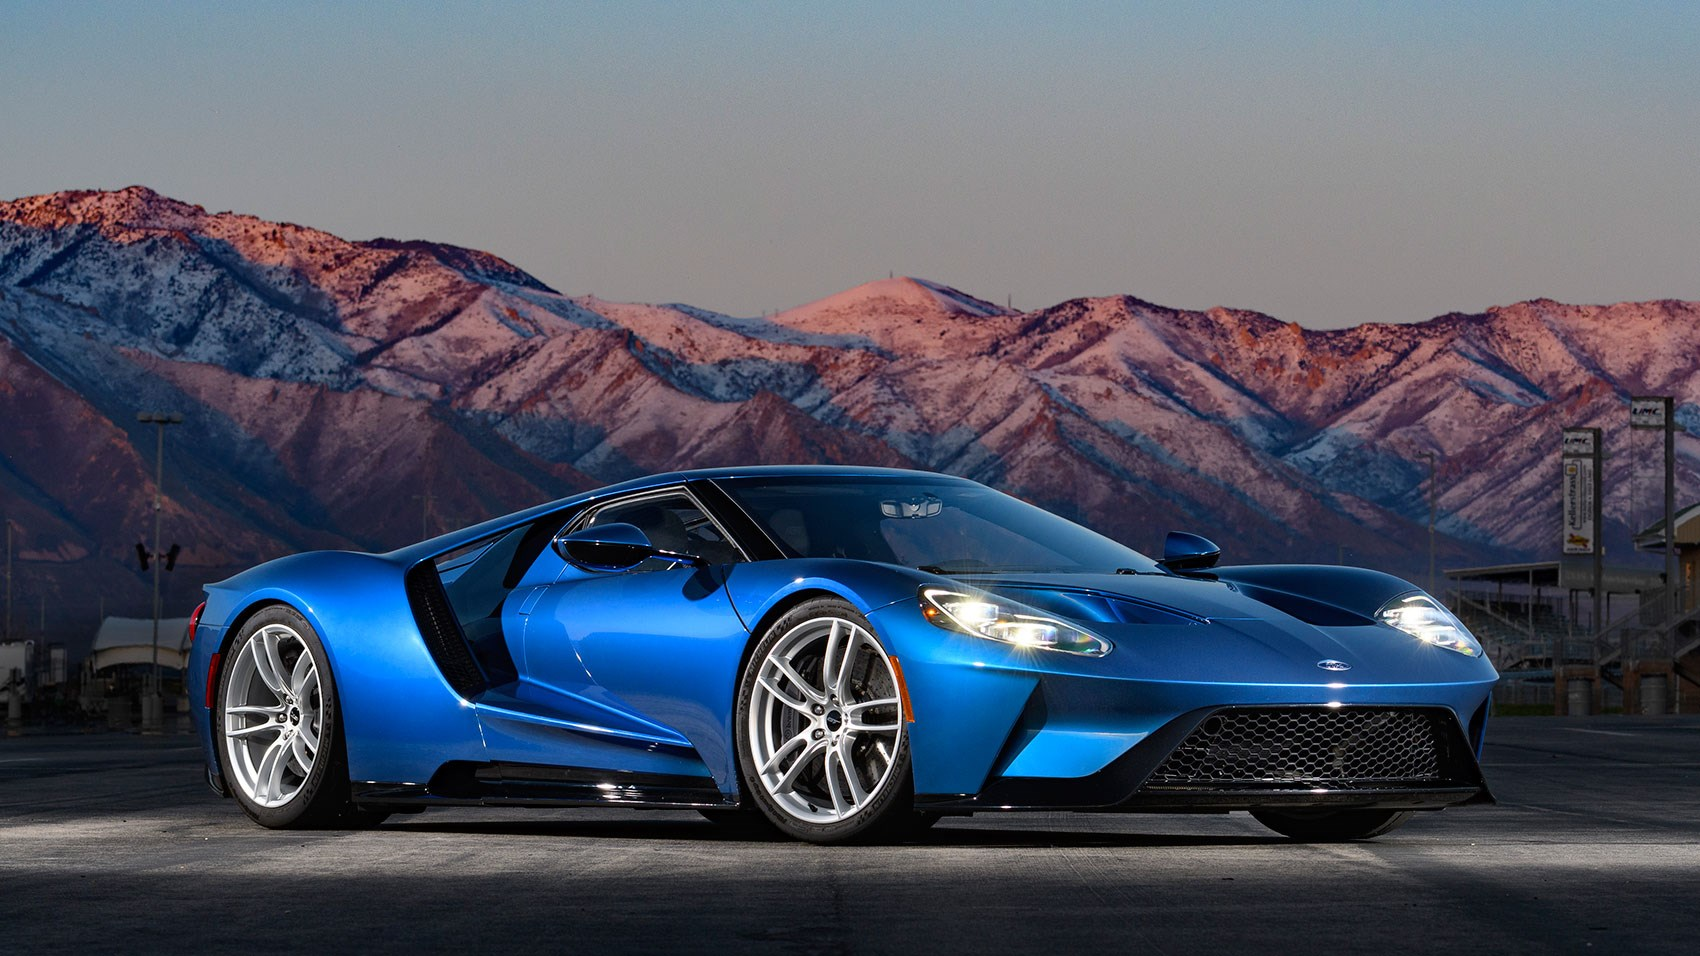 ... Ford GT made of carbonfibre and aluminium ... & Ford GT supercar (2017) review by CAR Magazine markmcfarlin.com